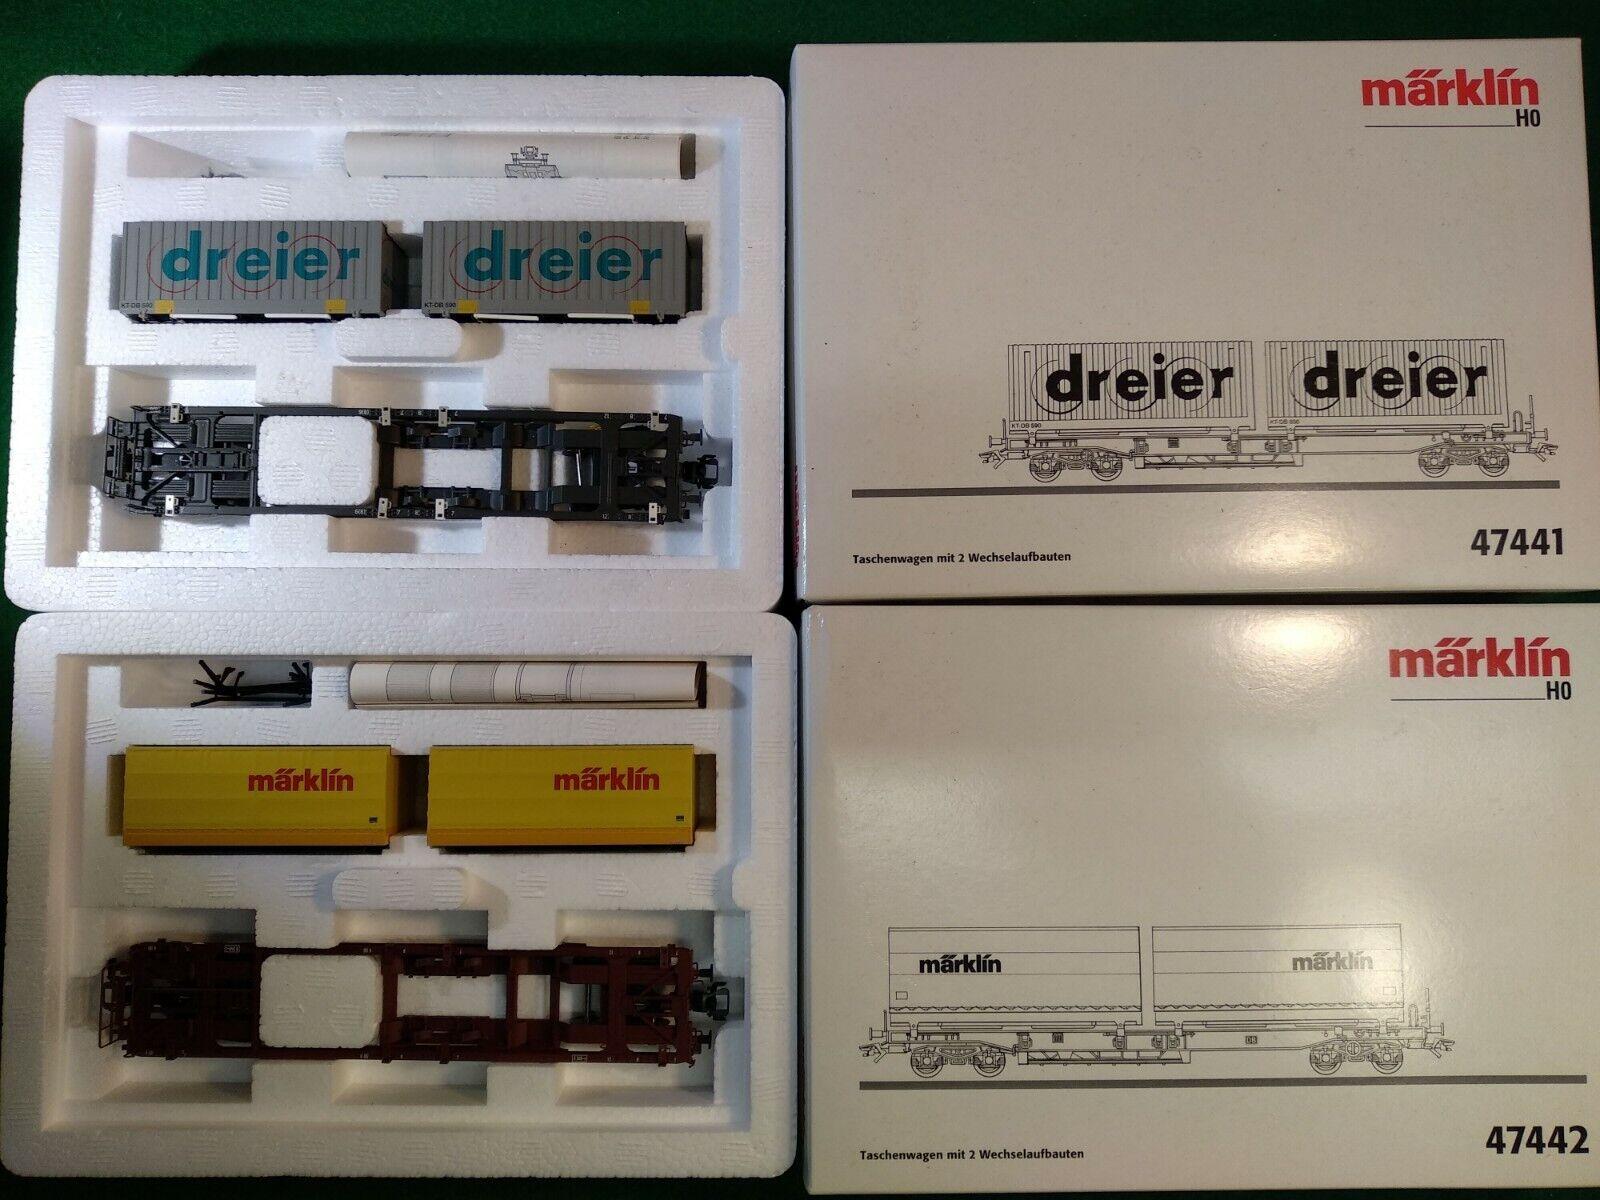 Marklin Container autos Dreier & Marklin 47441 & 47442 OVP Excellent